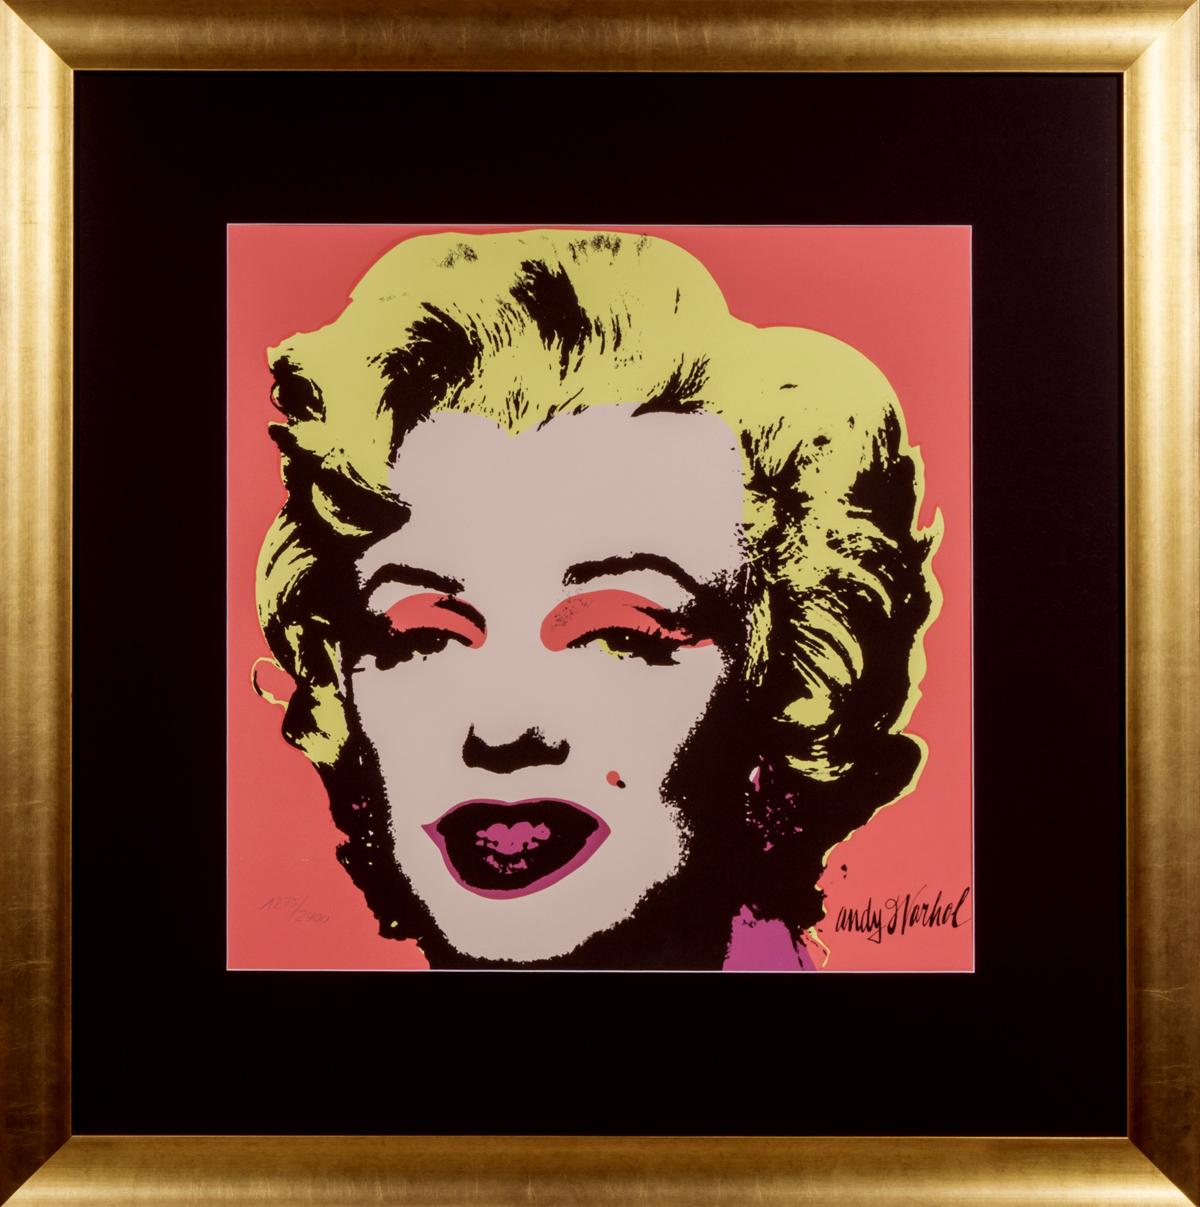 Marilyn Monroe in frame